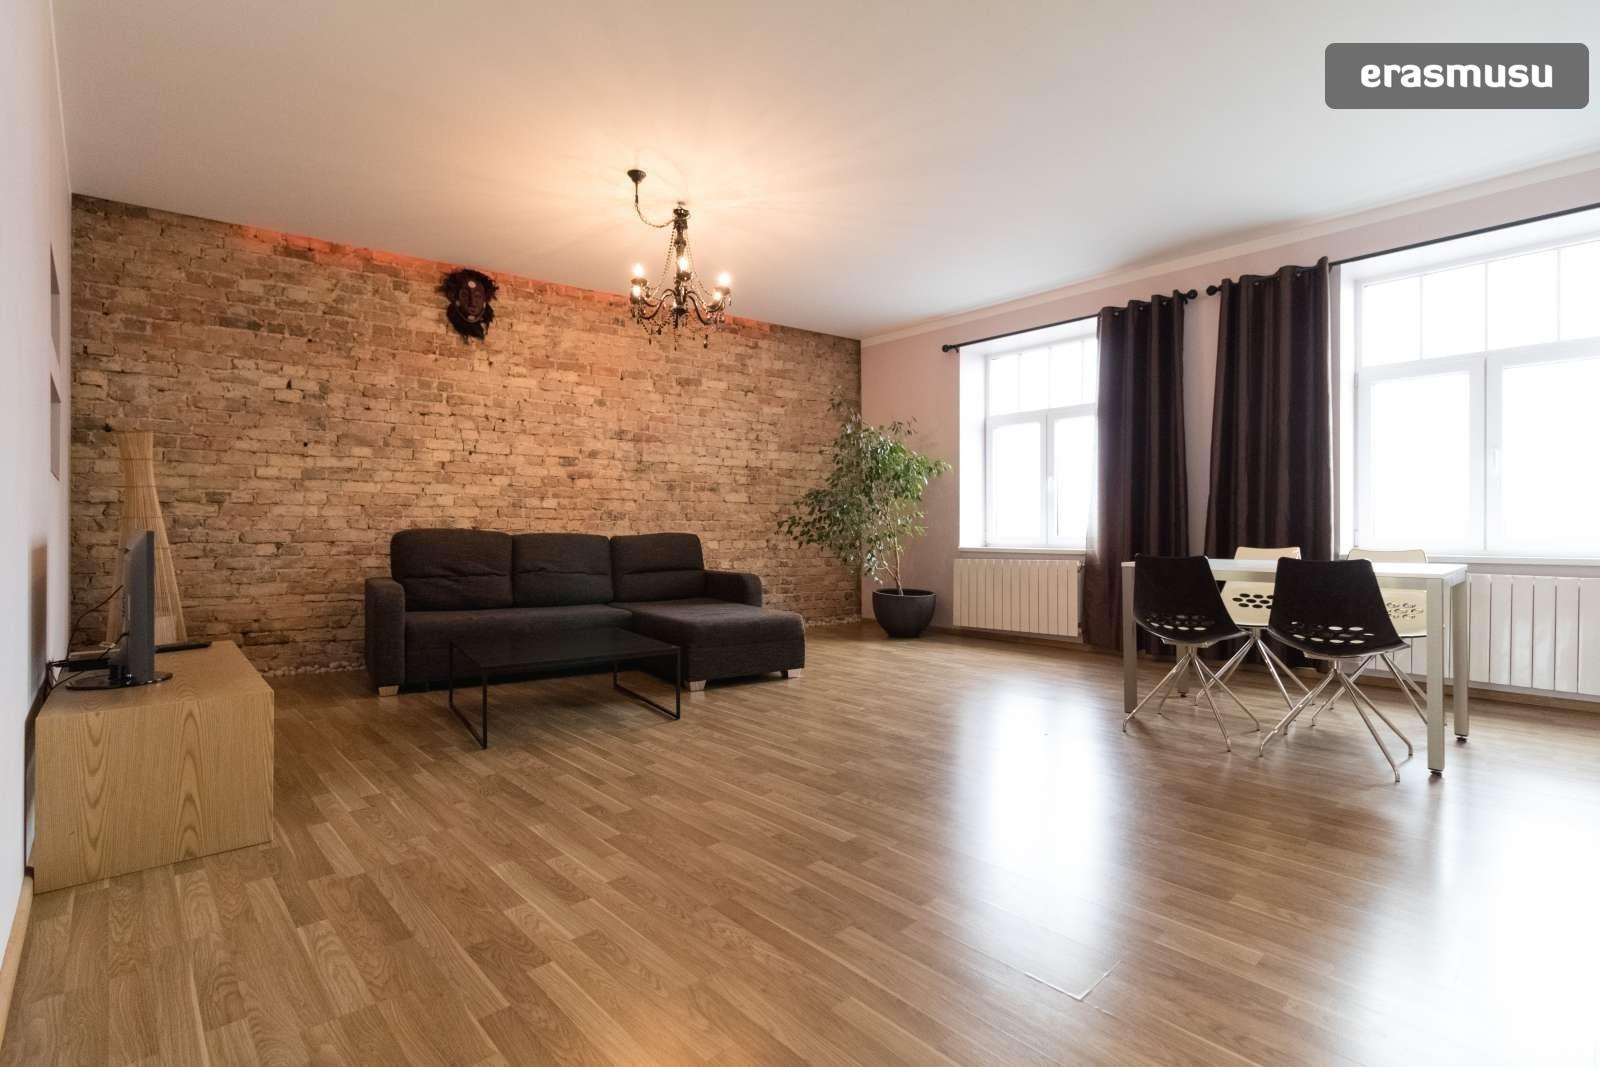 stylish-2-bedroom-apartment-rent-maskavas-forstate-bae79089a065f